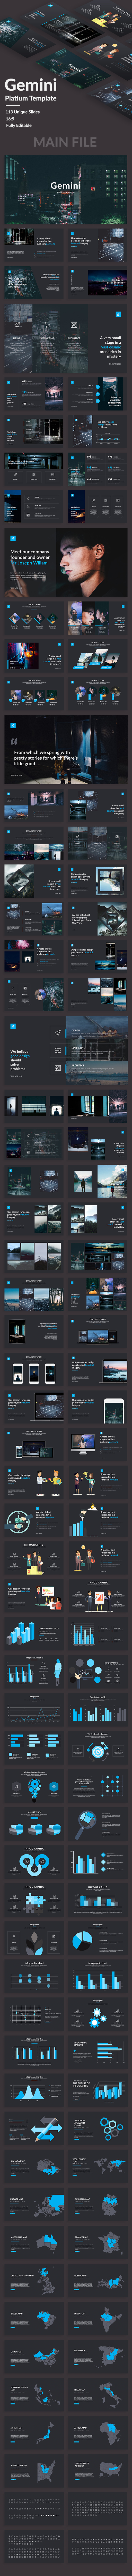 Gemini Platium Keynote Template - Creative Keynote Templates